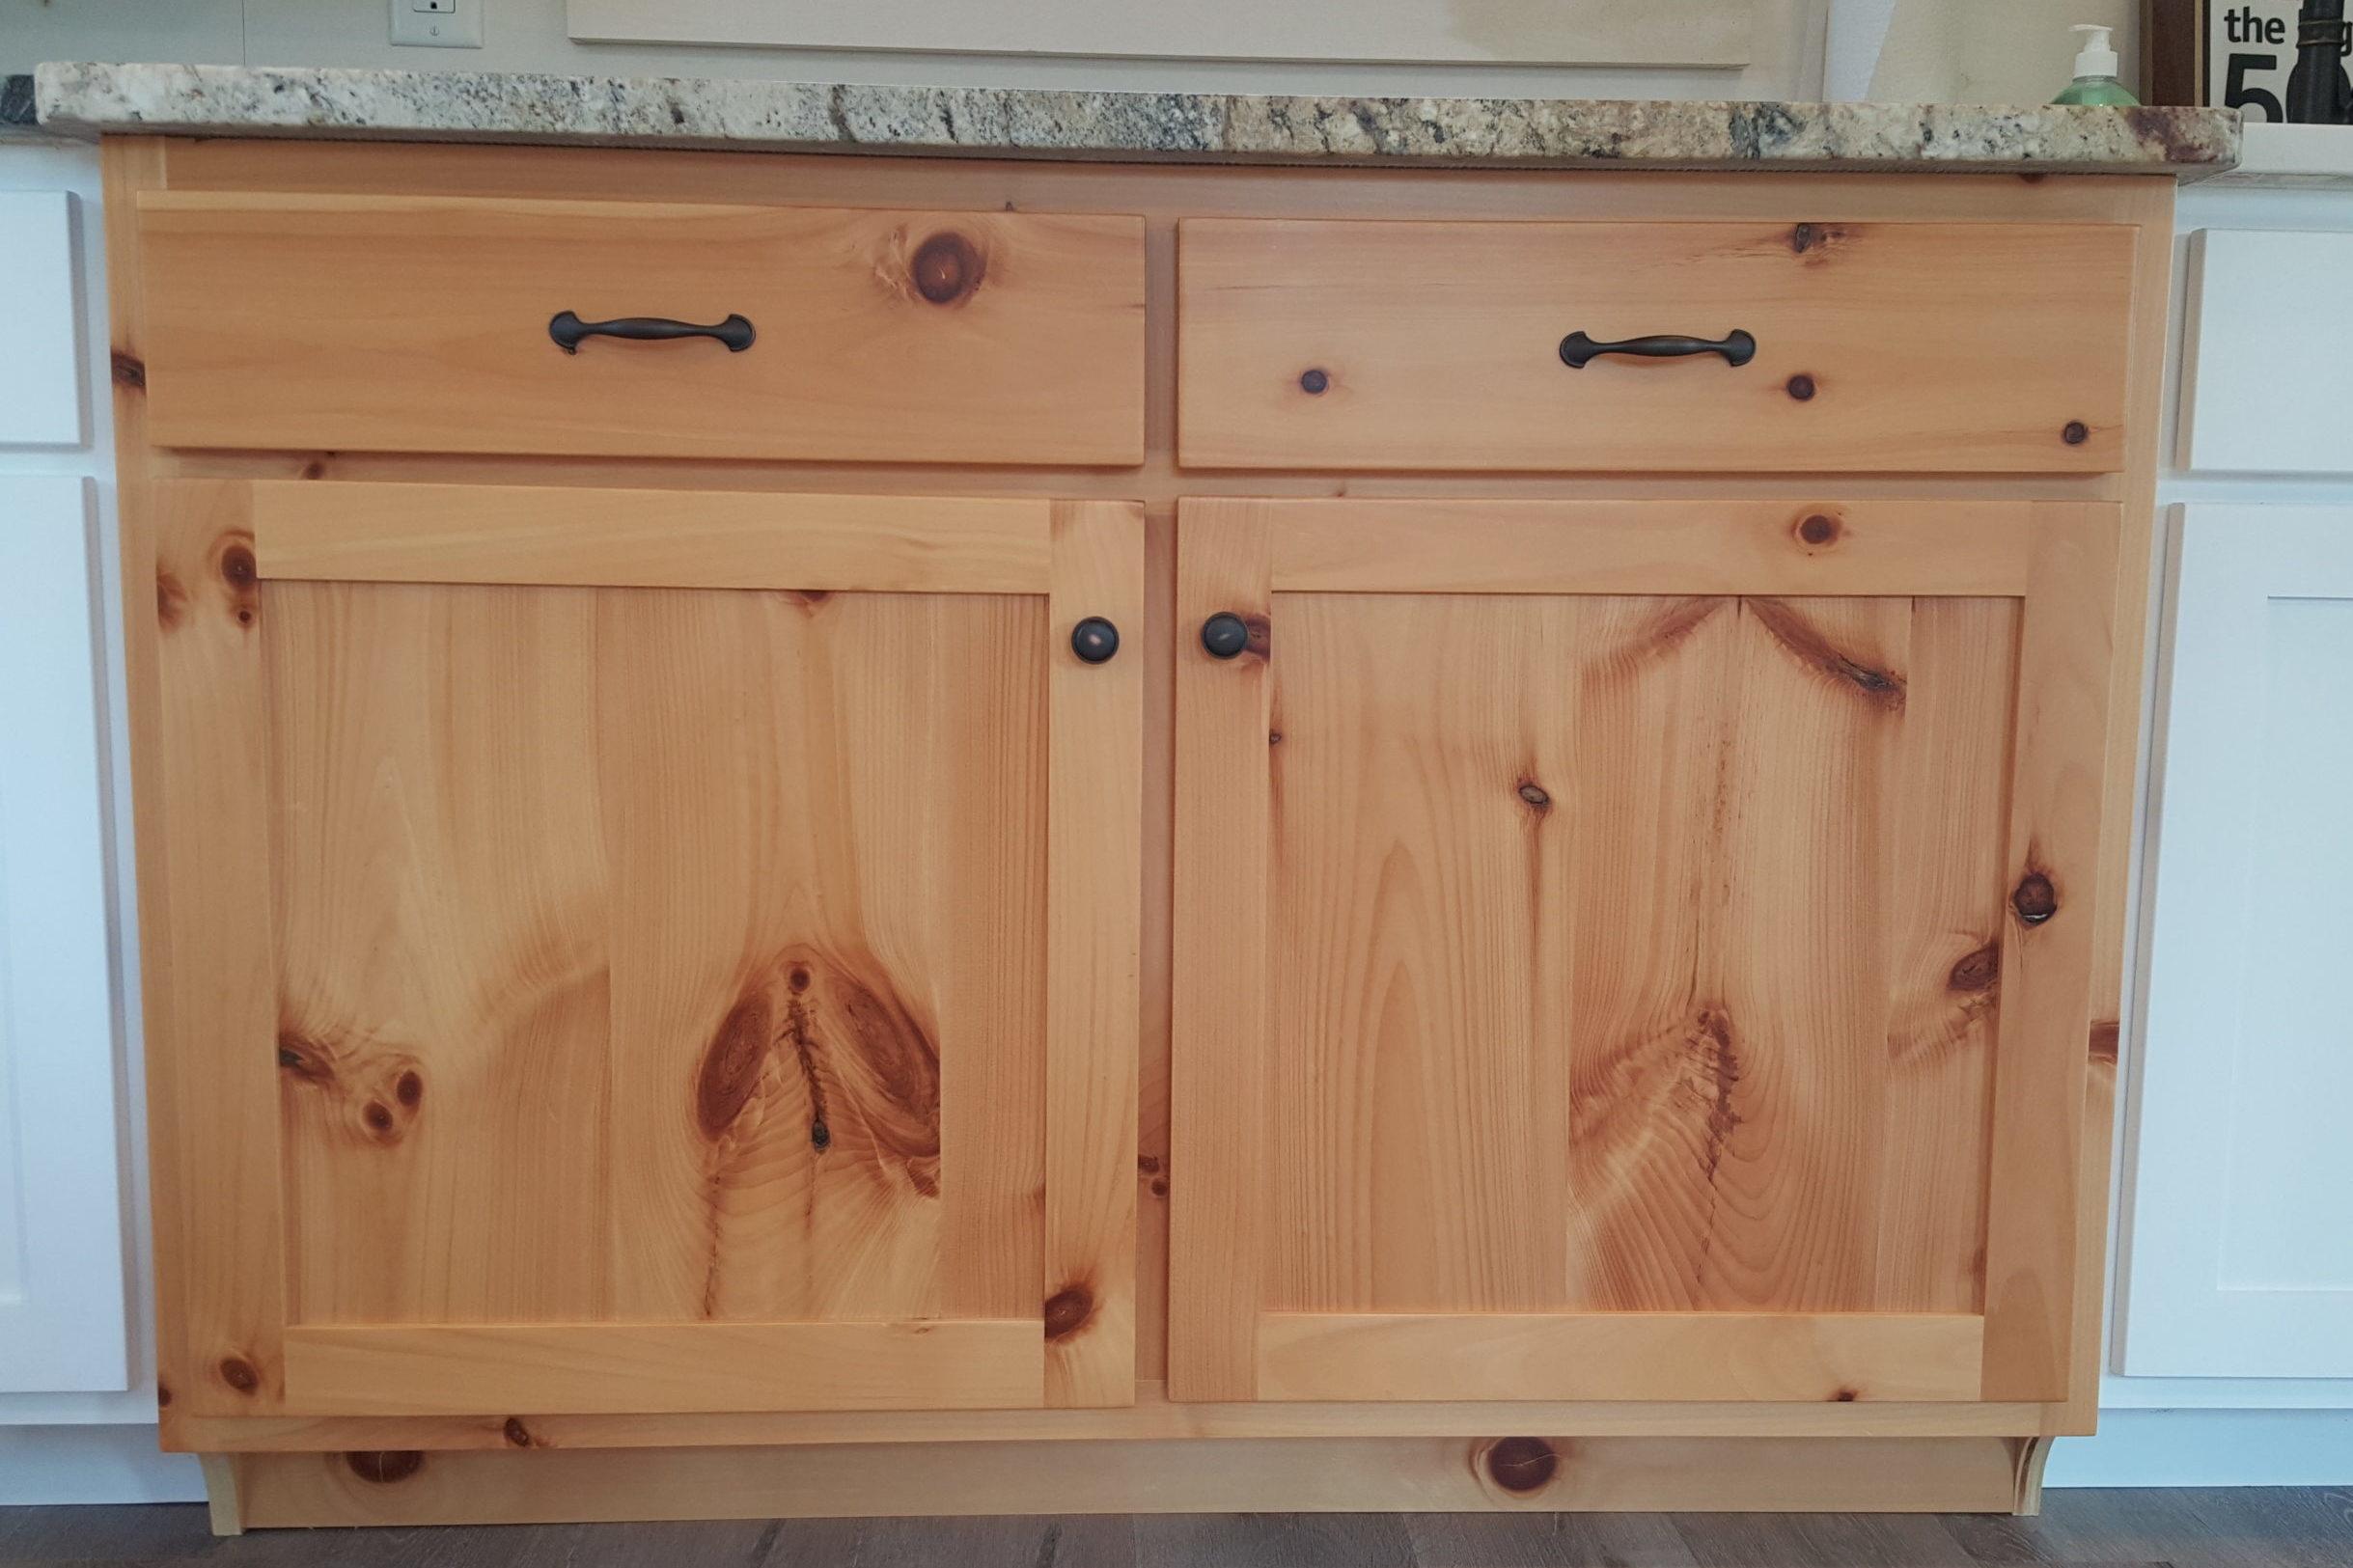 Flat recessed panel (Pine)